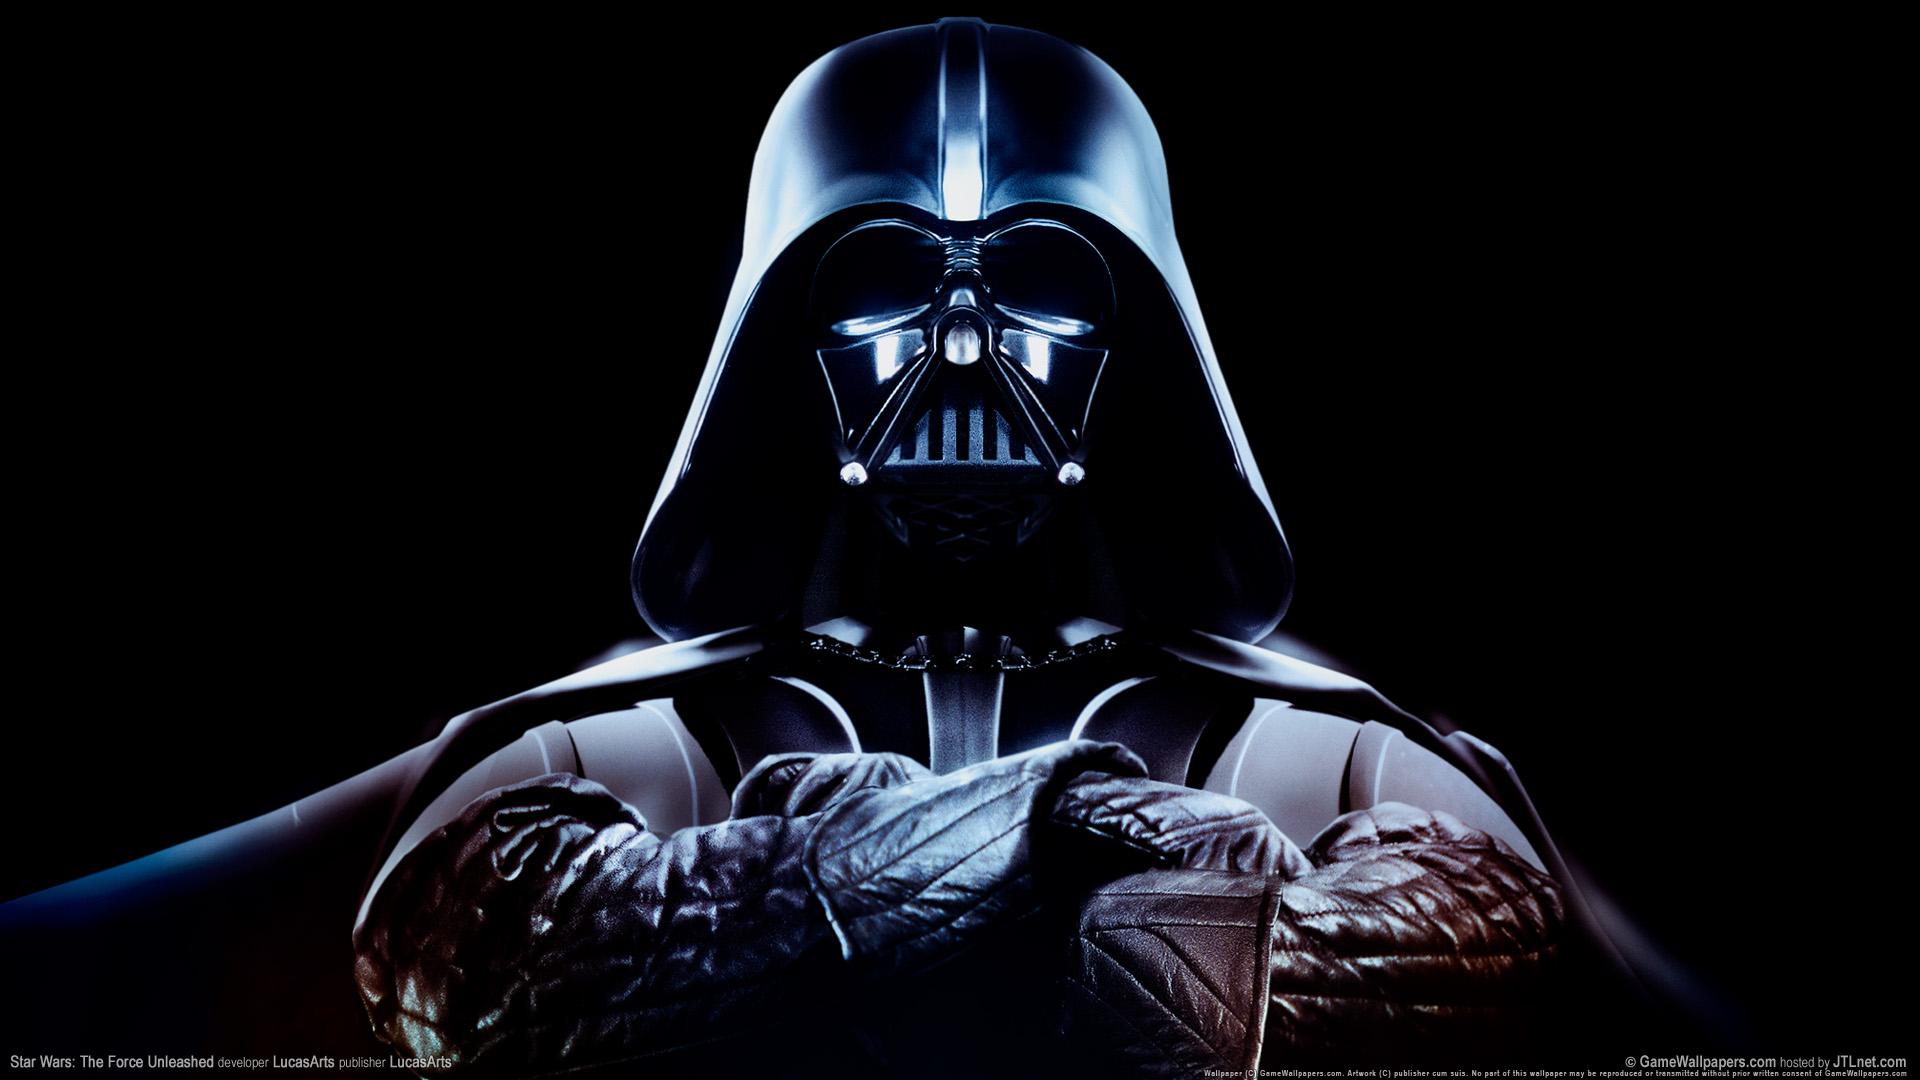 Star Wars Taking Over Disney?